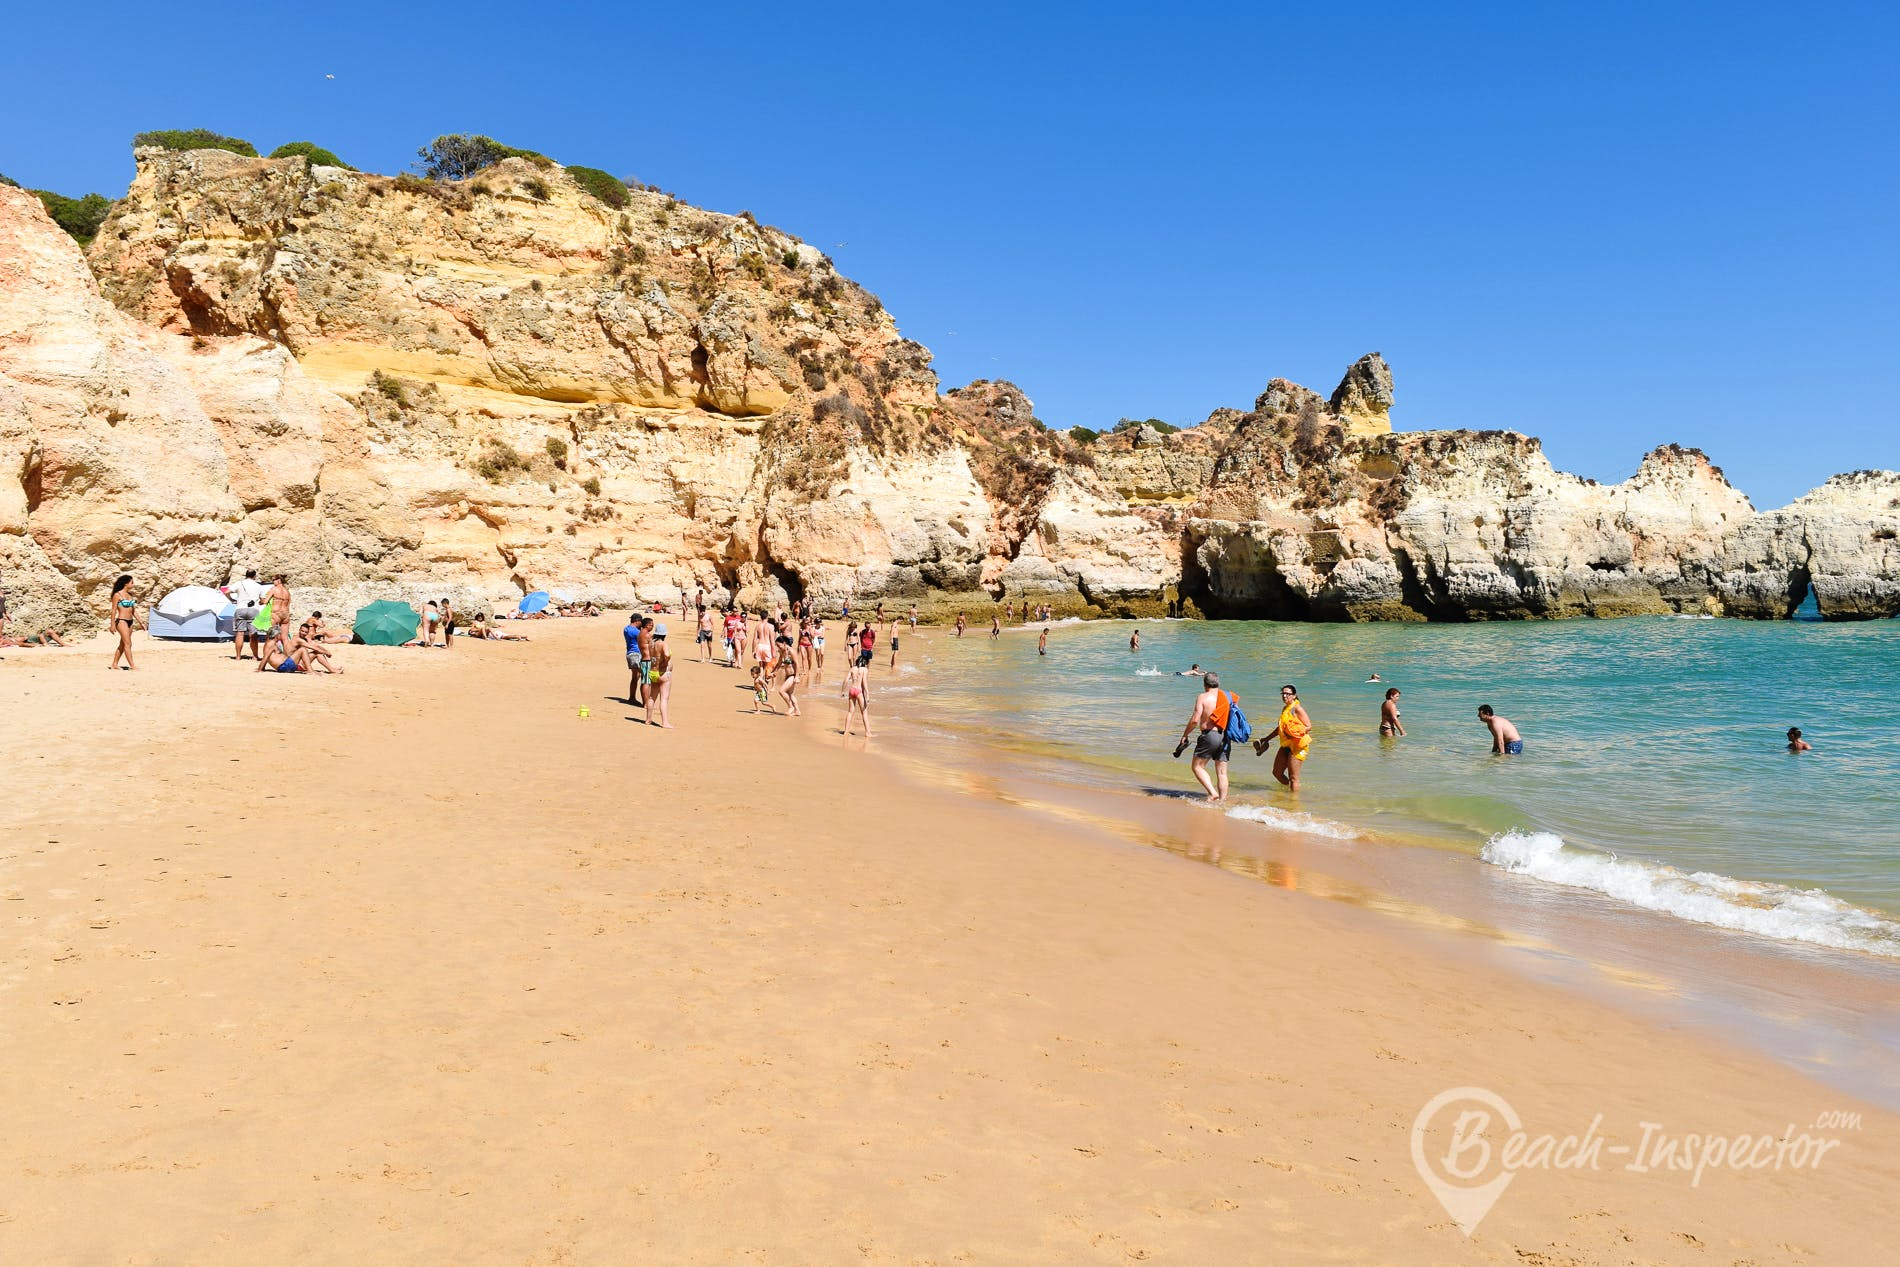 Beach Praia dos Três Irmãos, Algarve, Portugal